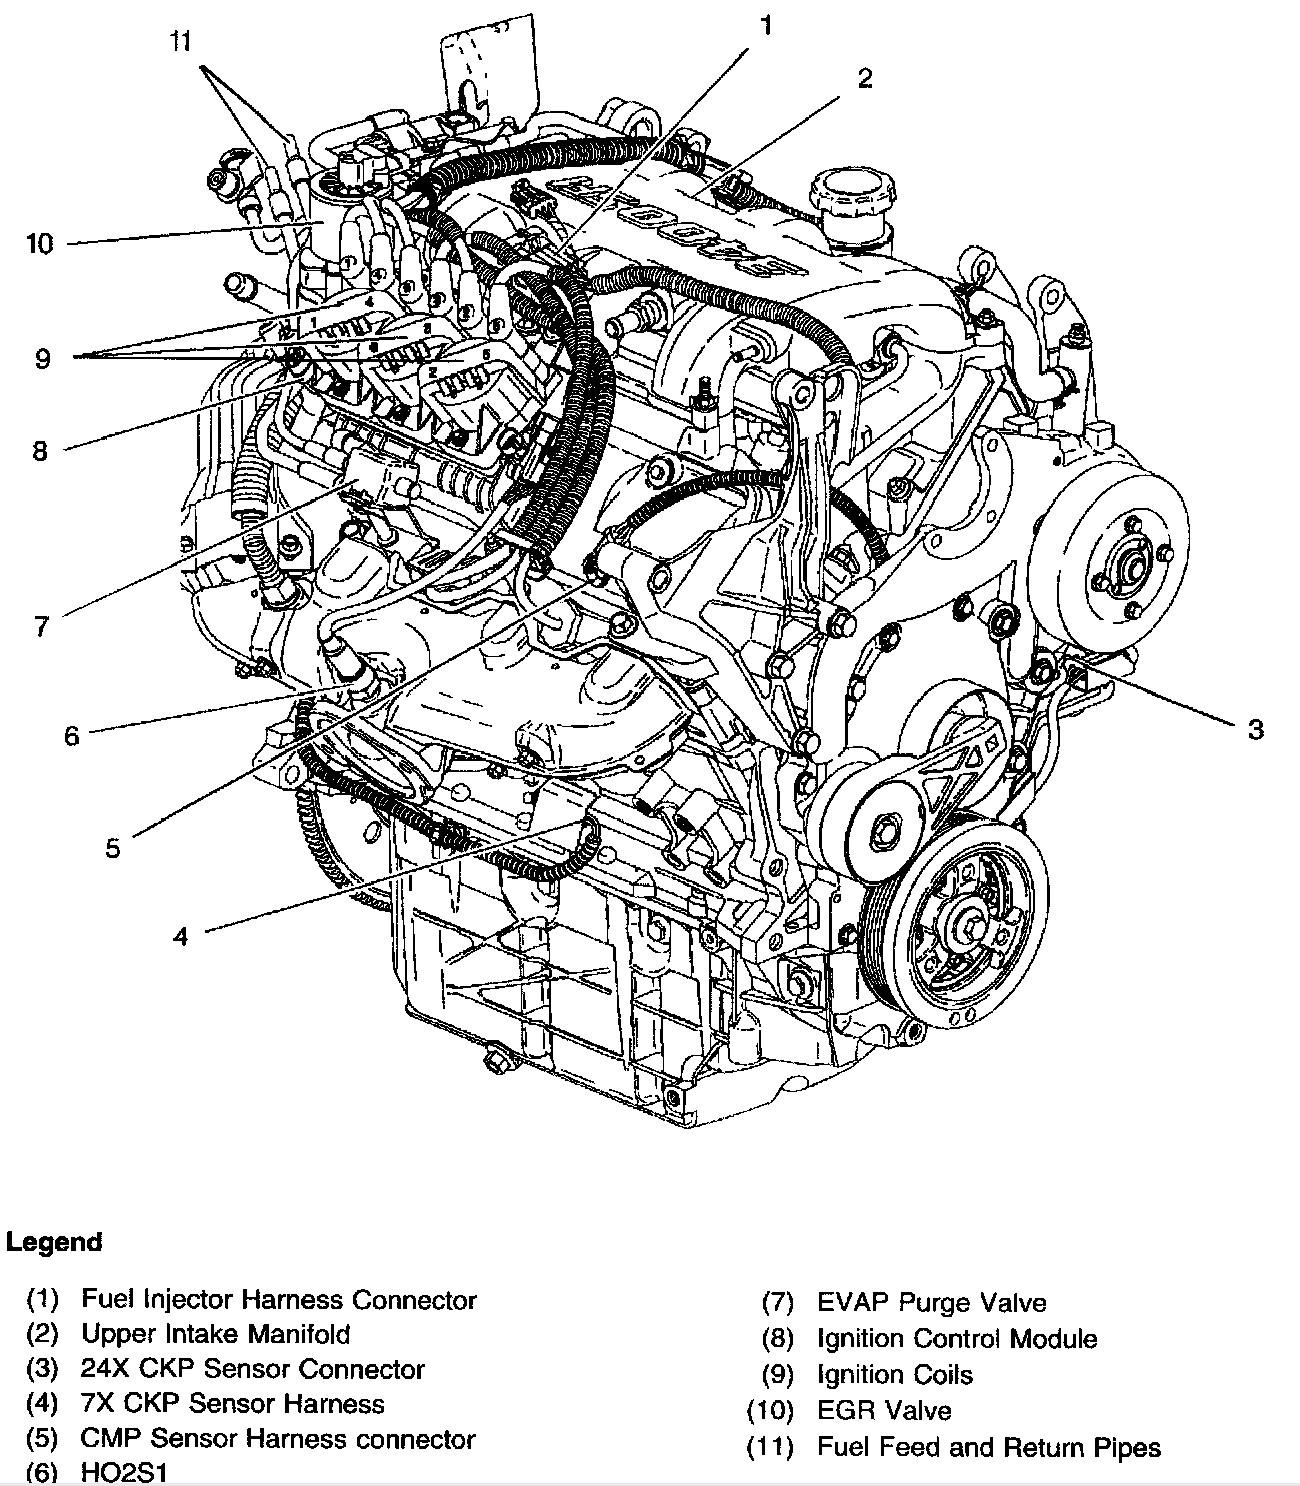 99 Chevy Malibu Engine Diagram 1999 Malibu 3 1 Engine Diagram Wiring Diagram New